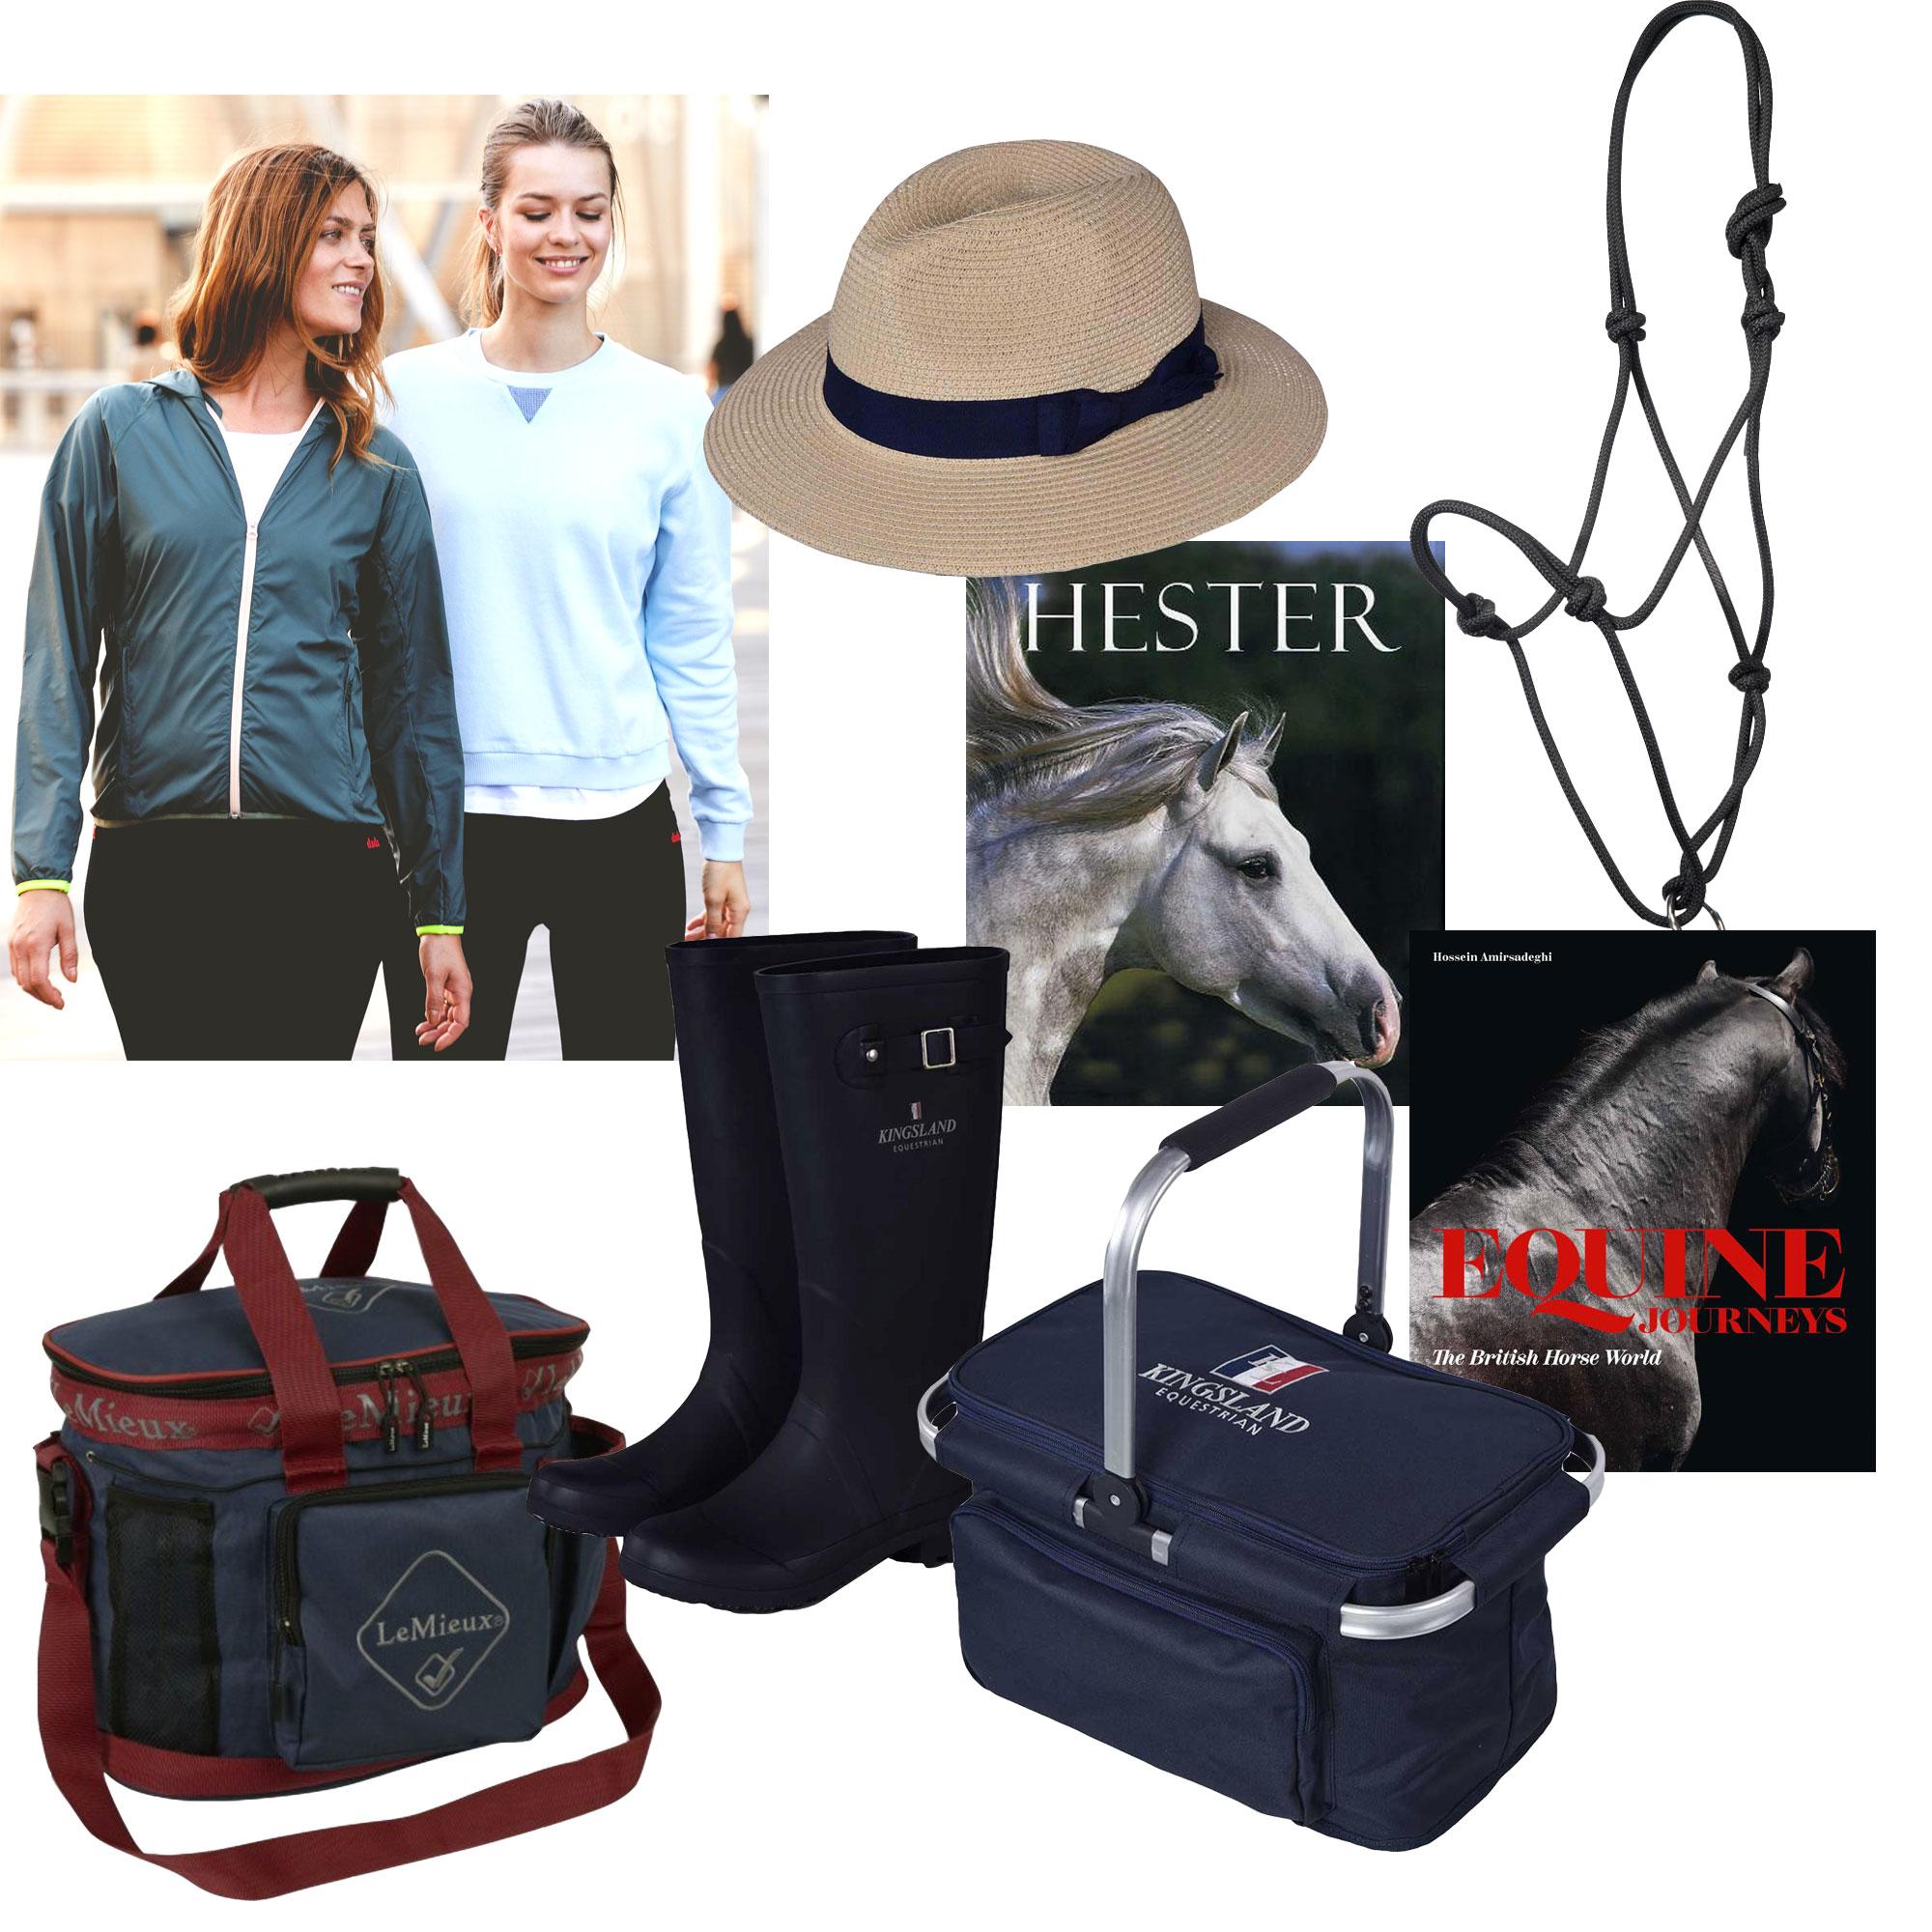 "Photo: Dada Sport / Kingsland / Hööks / LeMieux / ""Hester"" by Nicola Jane Swinney / ""Equine Journeys – The British Horse World"" by Hossein Amirsadegh"